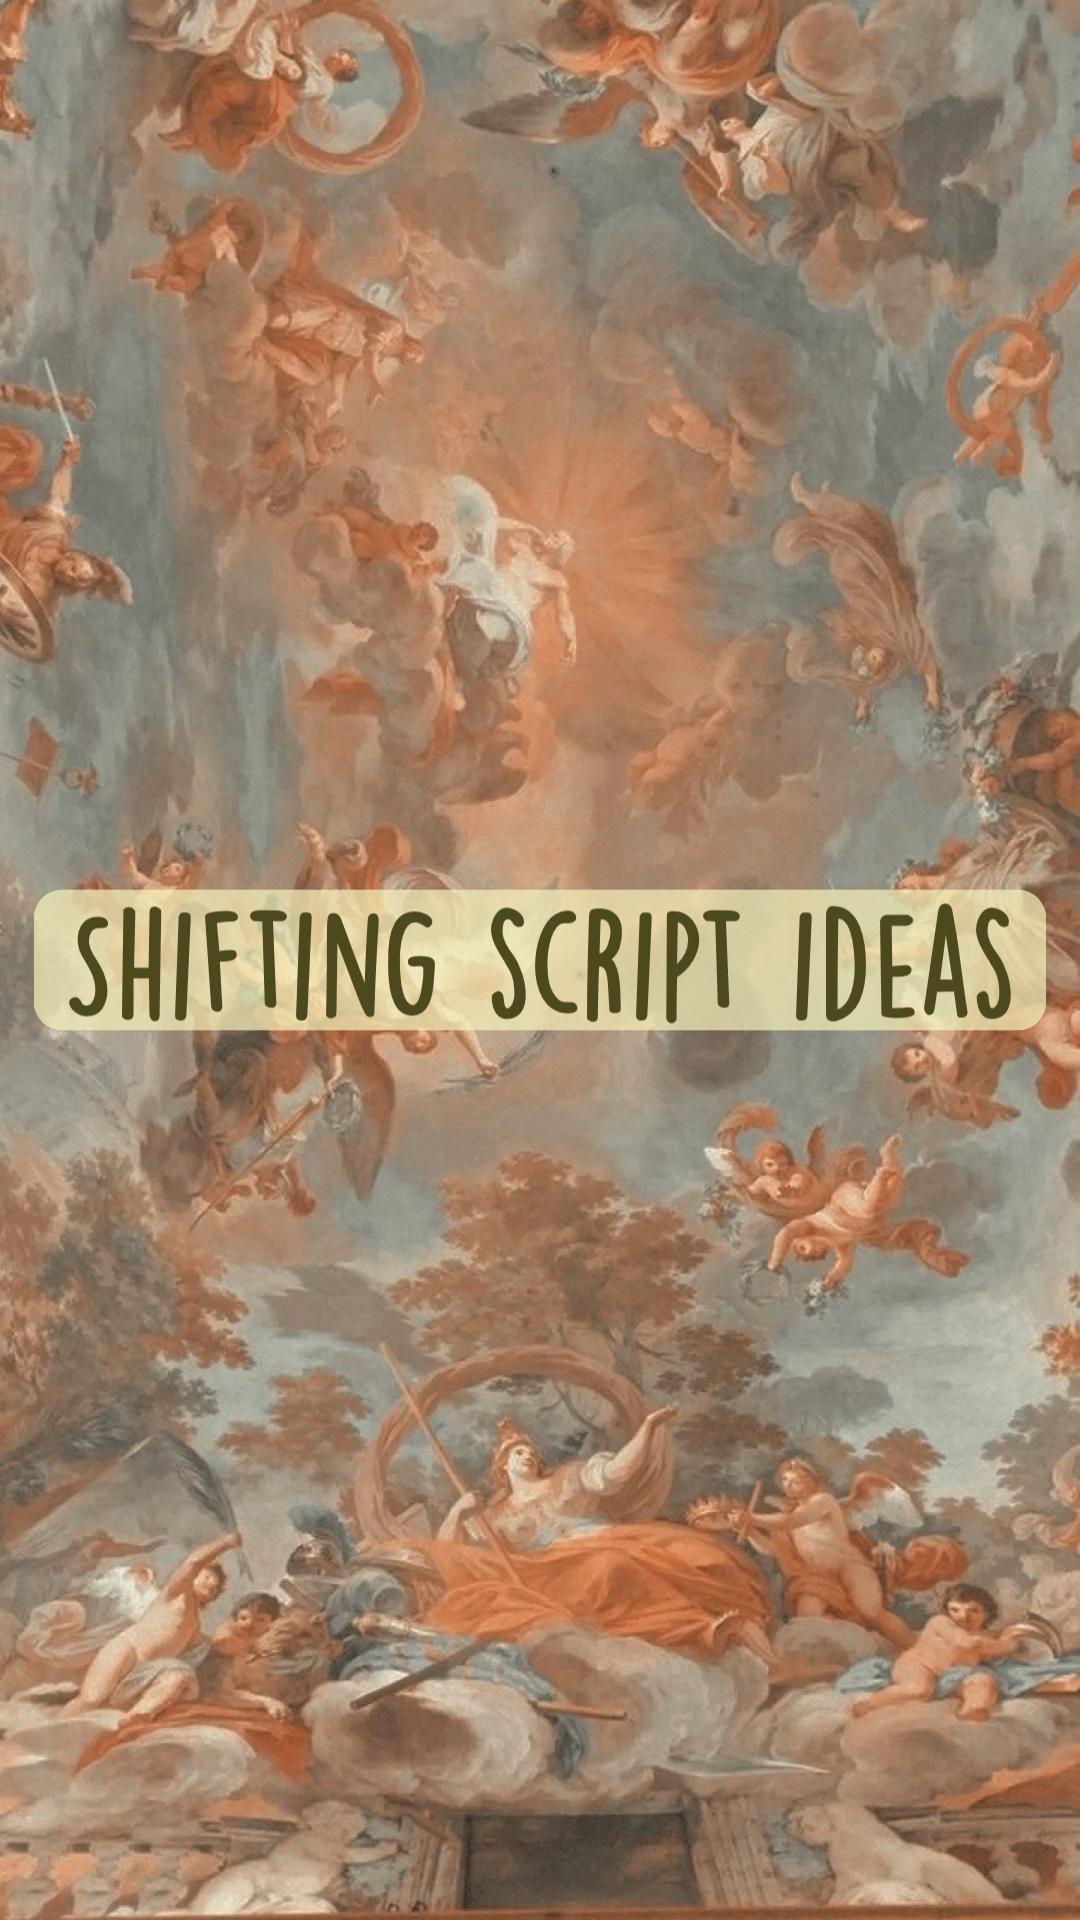 Shifting script ideas